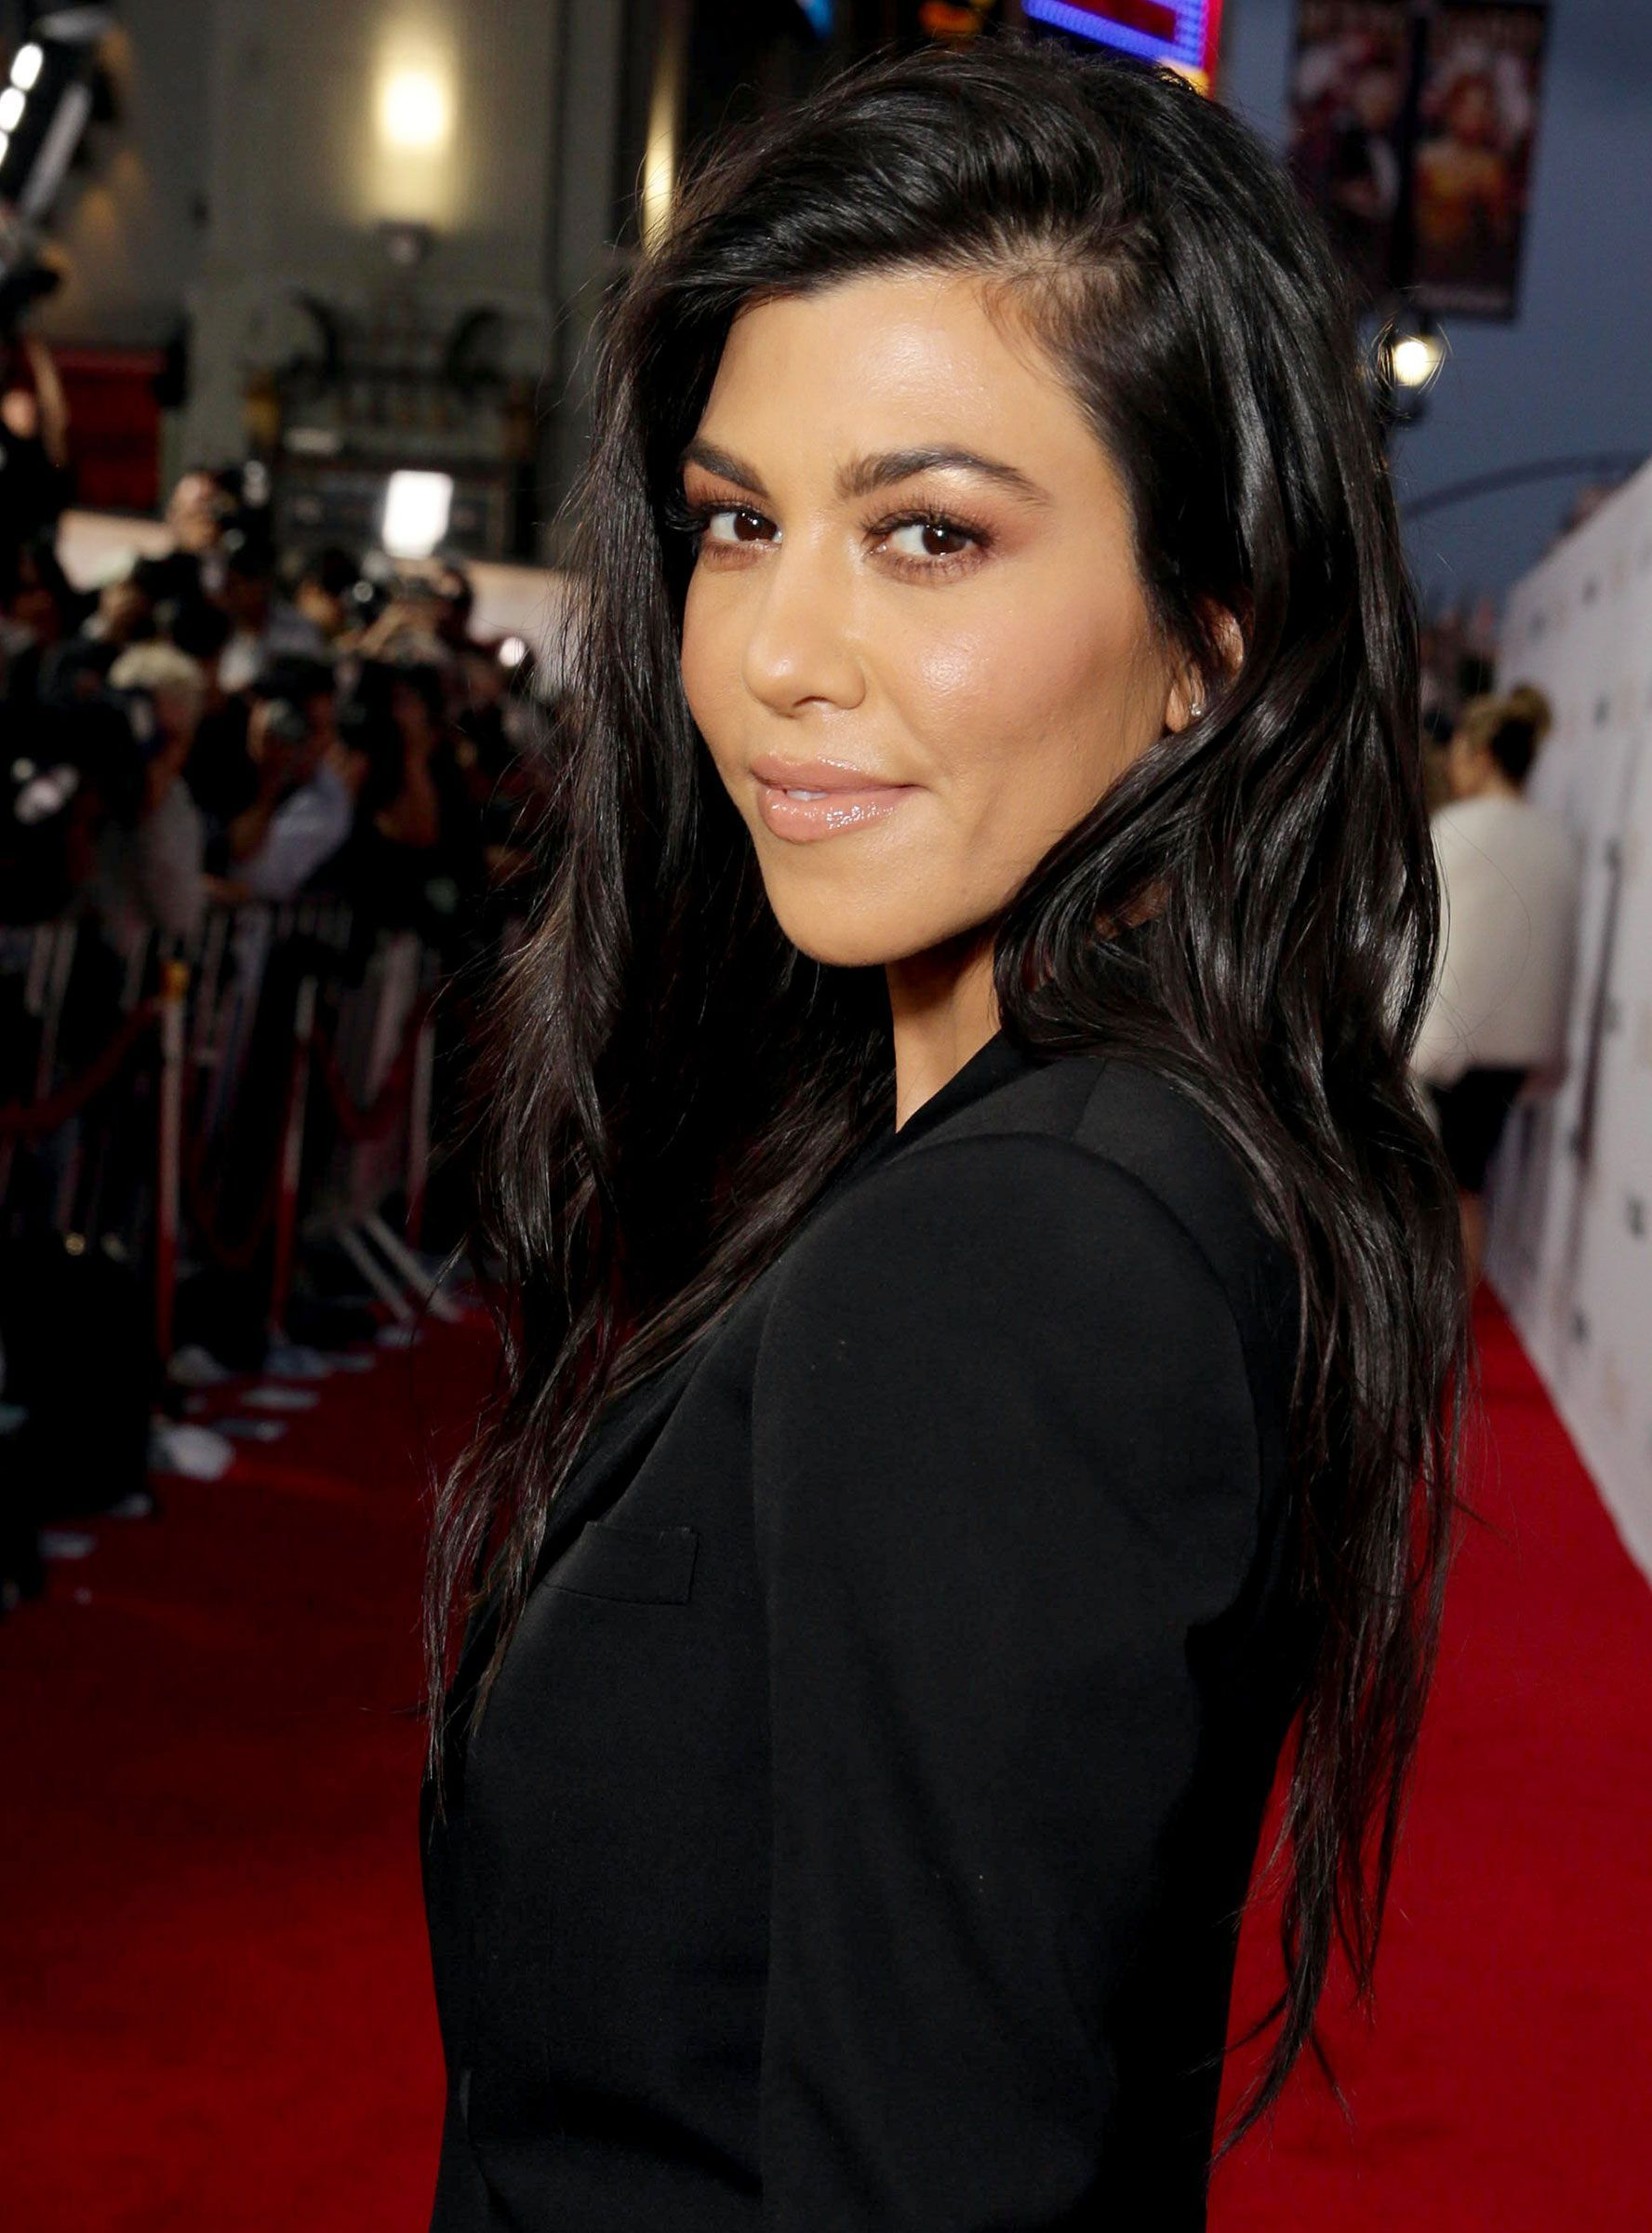 Kourtney Kardashian Is Living It Up In Egypt With Younes Bendjima